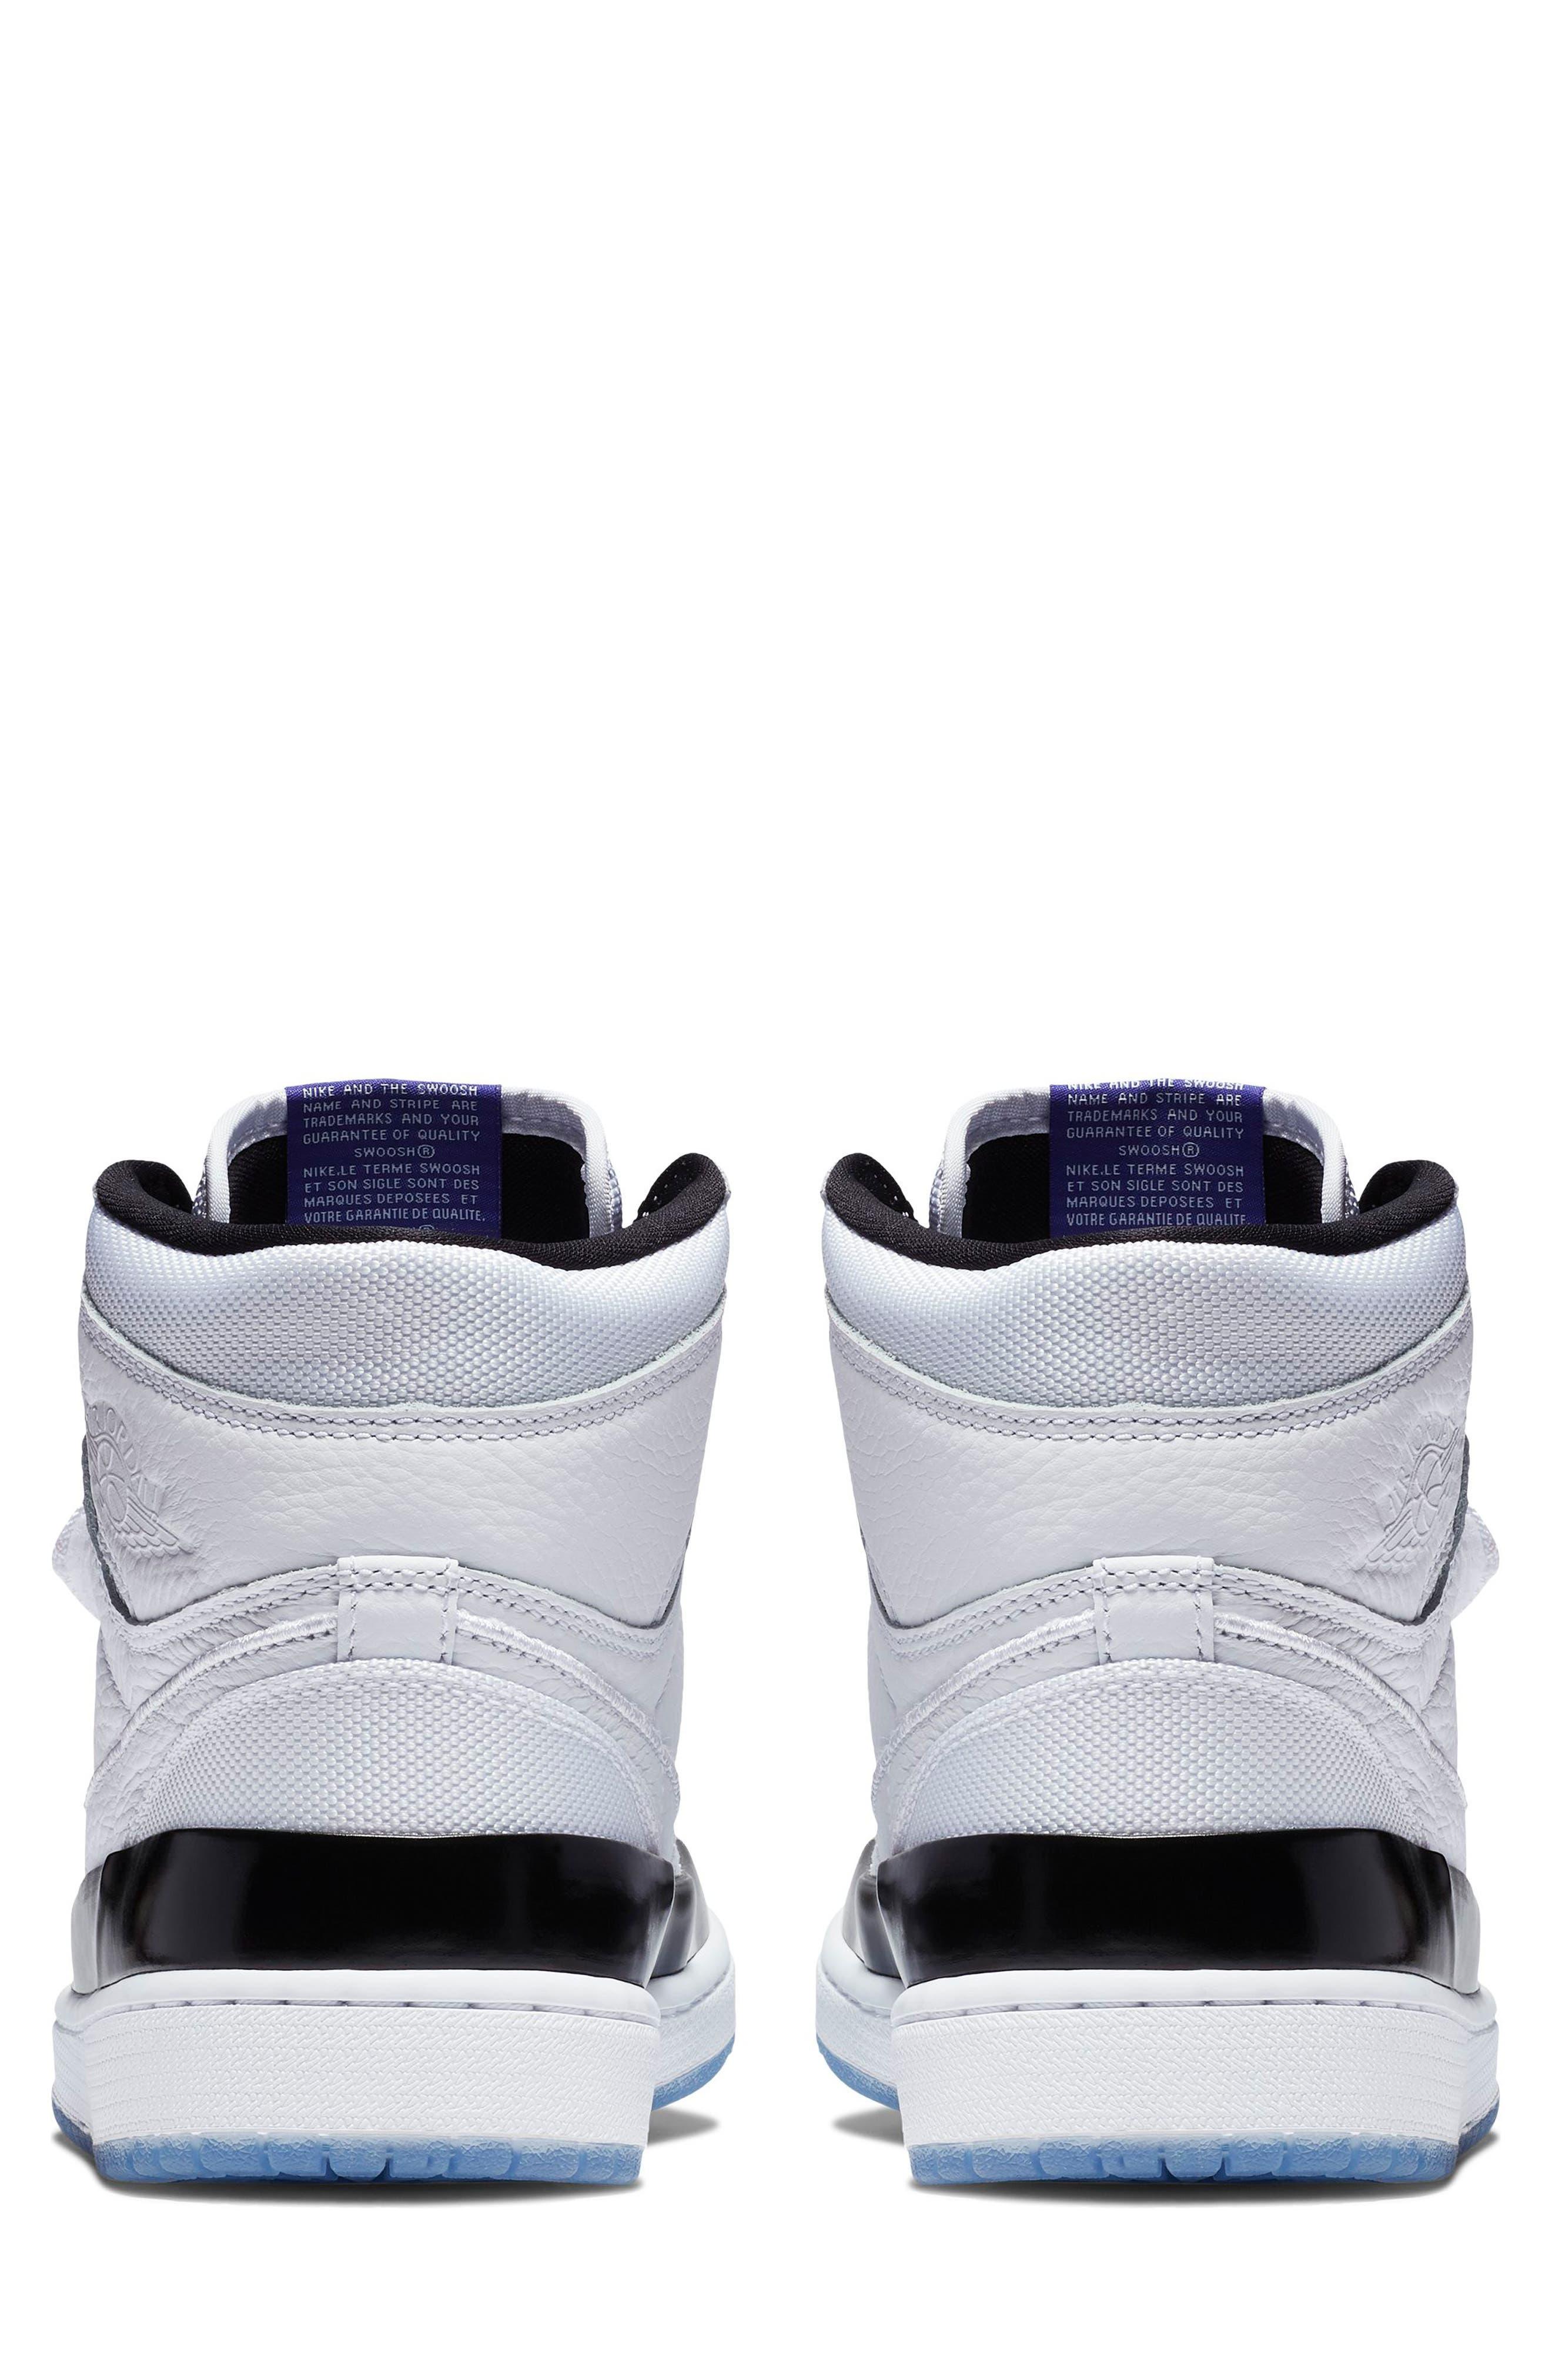 Air Jordan 1 Retro High Double Strap Sneaker,                             Alternate thumbnail 5, color,                             WHITE/ DARK CONCORD/ BLACK